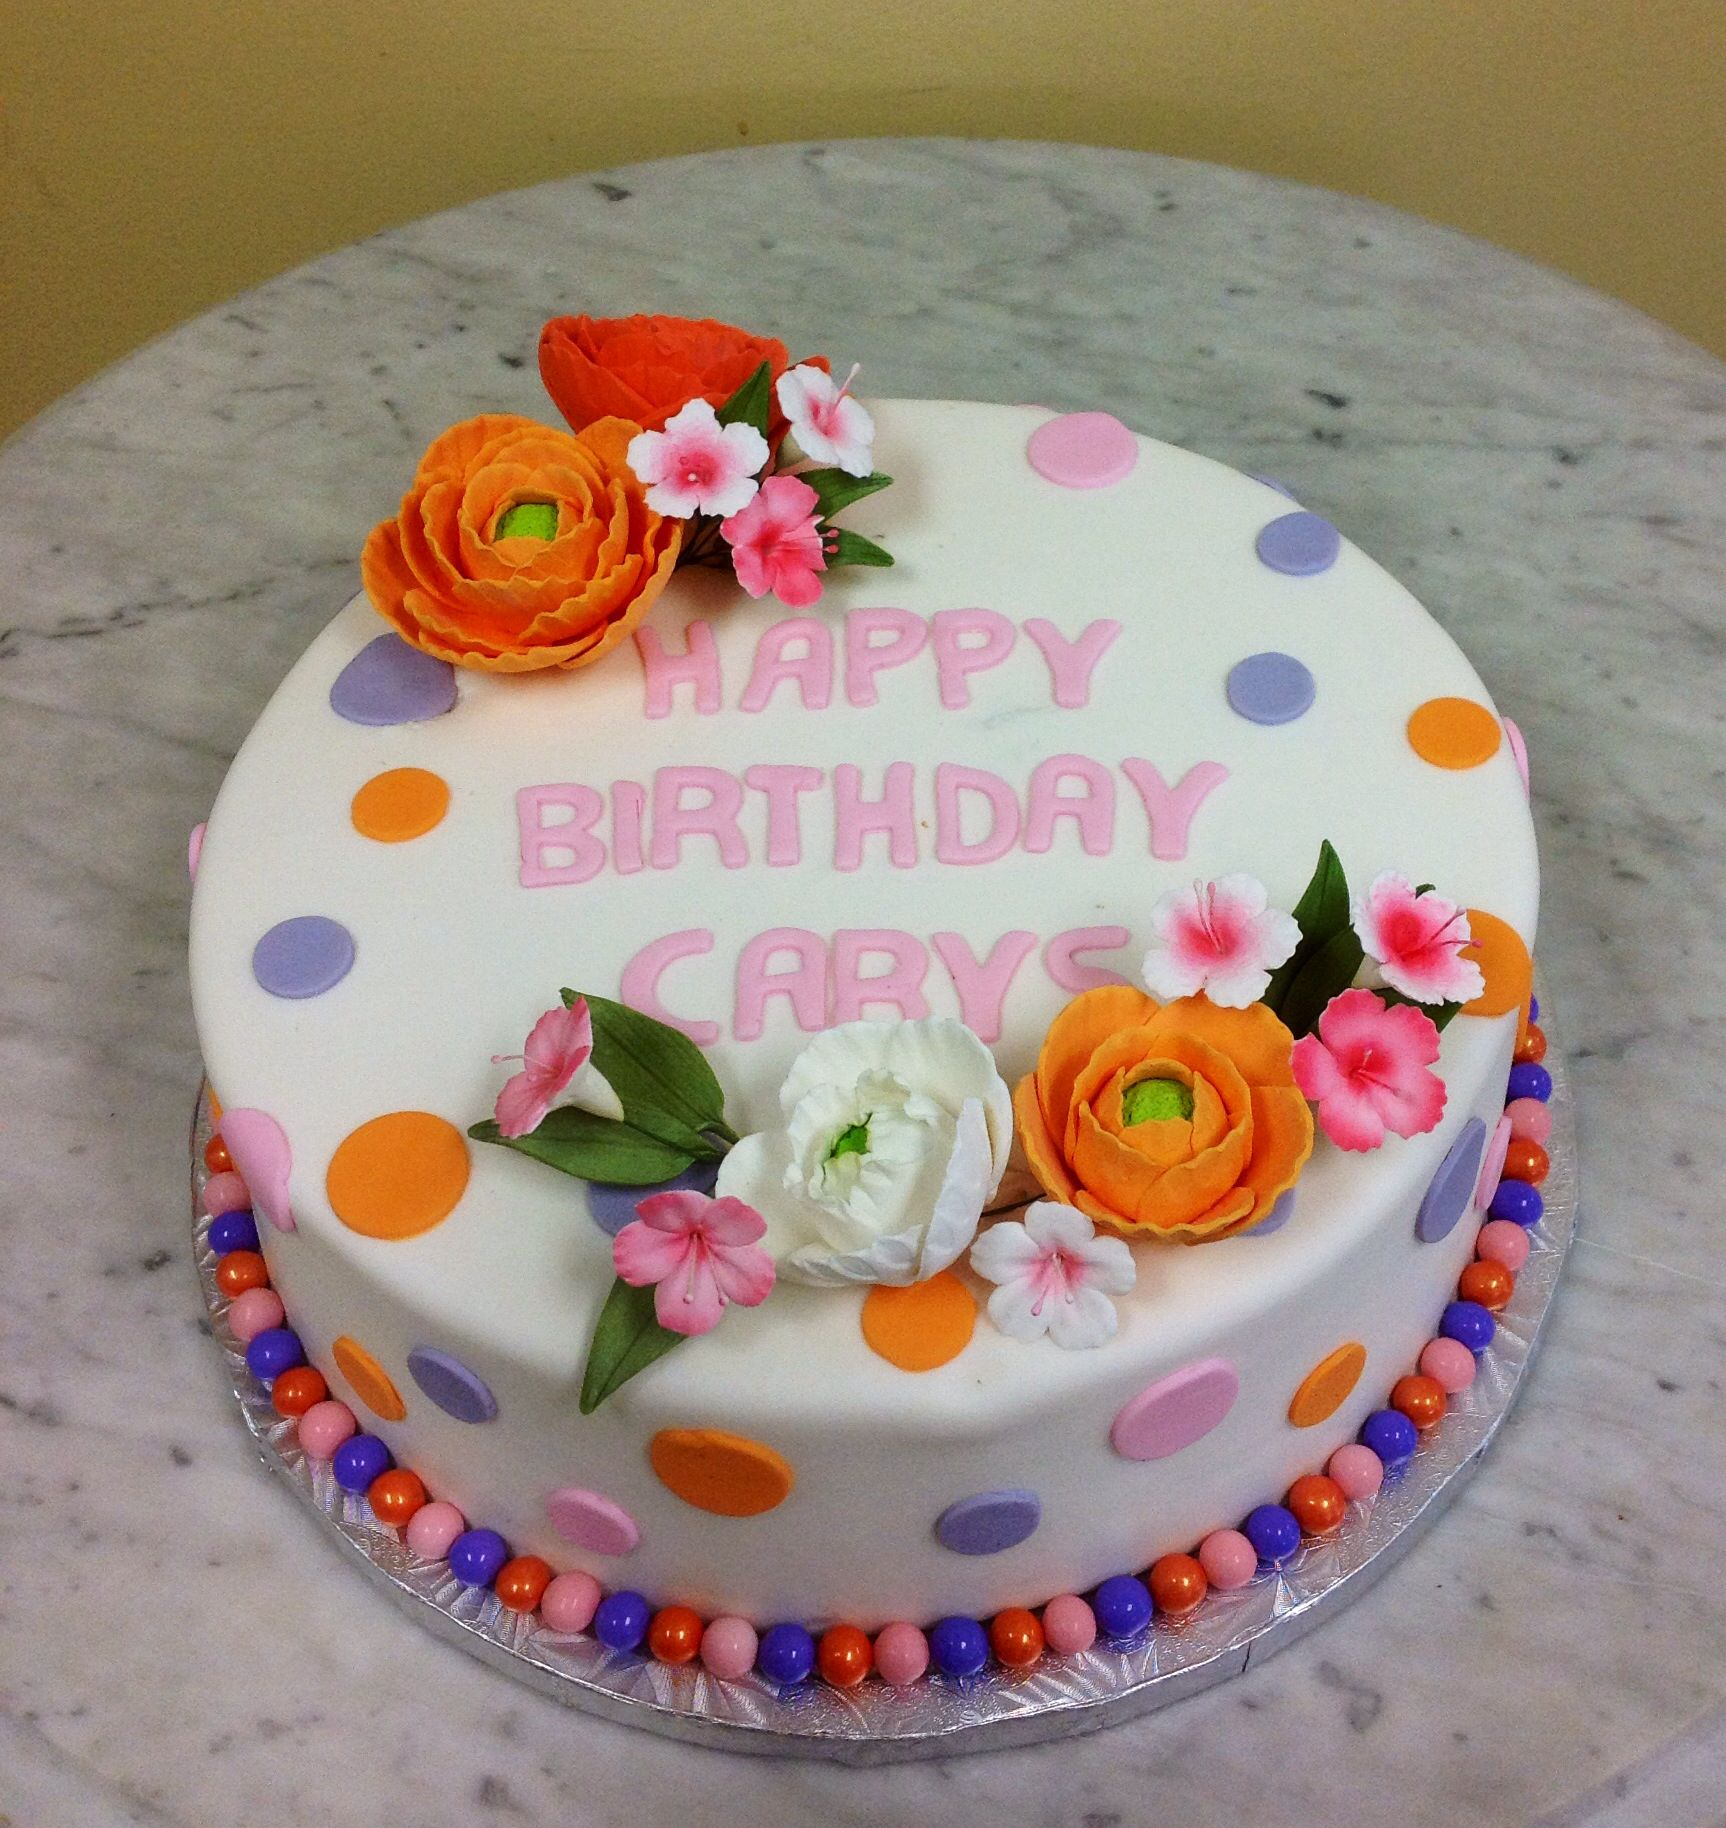 Flower cake cake specialty cakes yummy treats